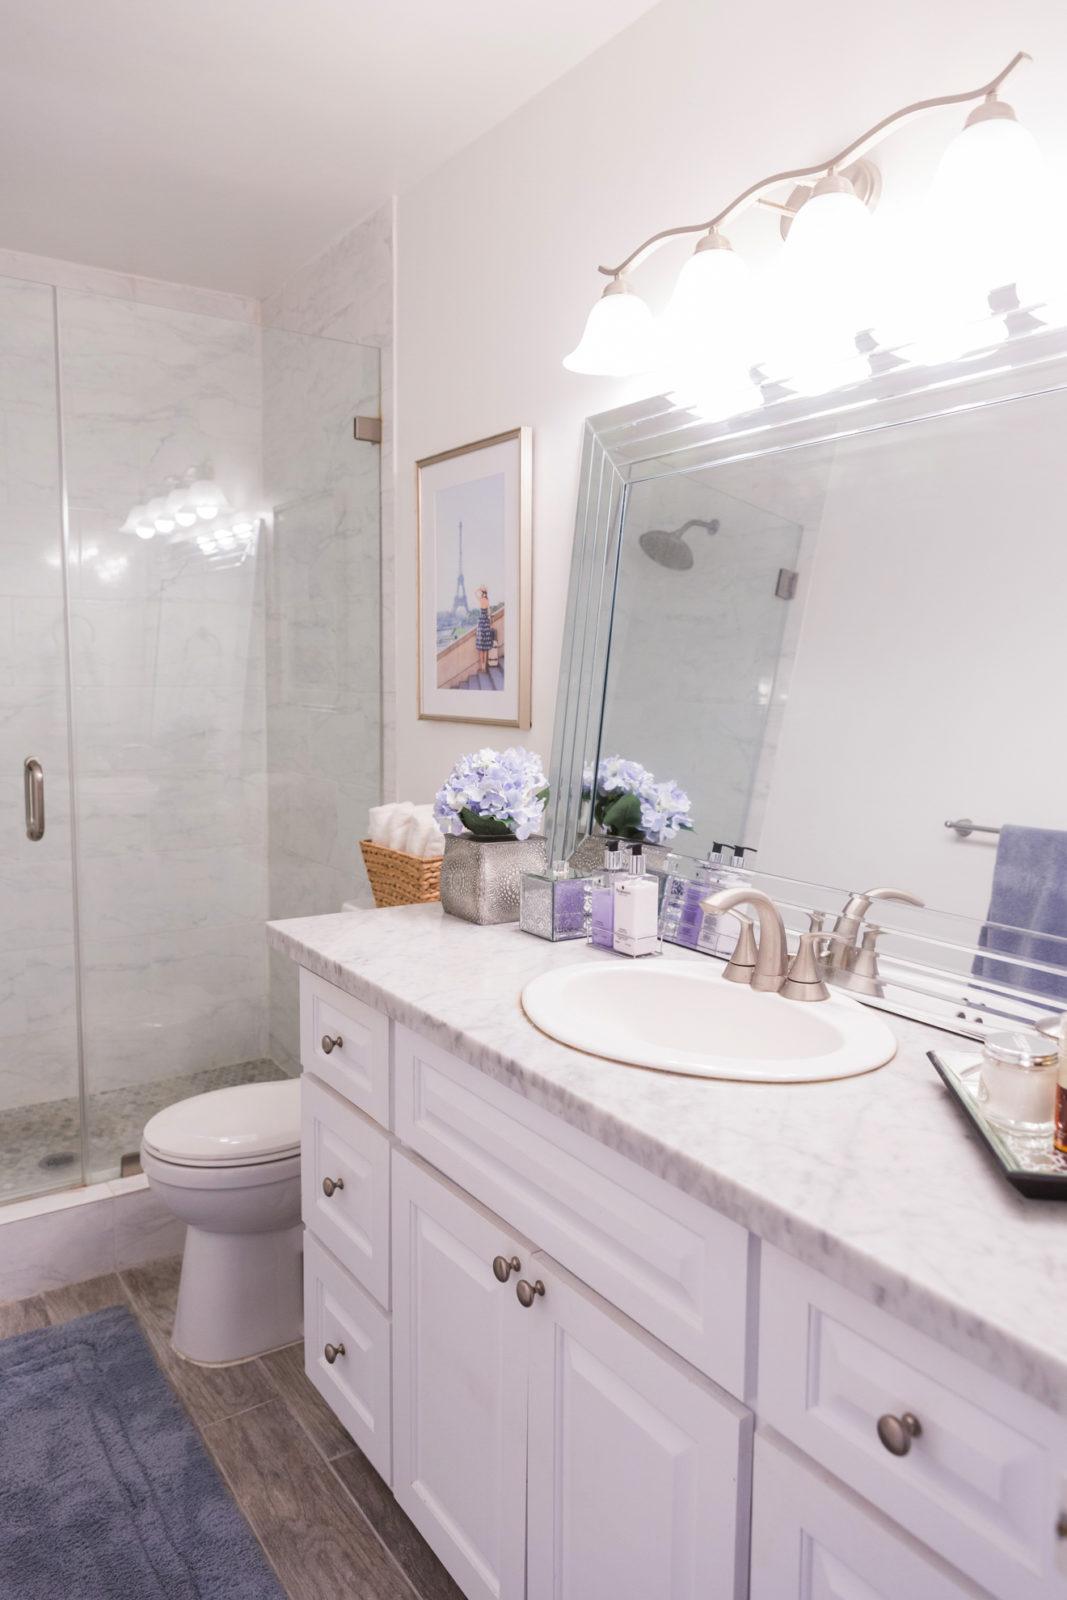 Modern Bathroom Remodel Ideas | Home Decor | Laura Lily on Bathroom Renovation Ideas  id=37511